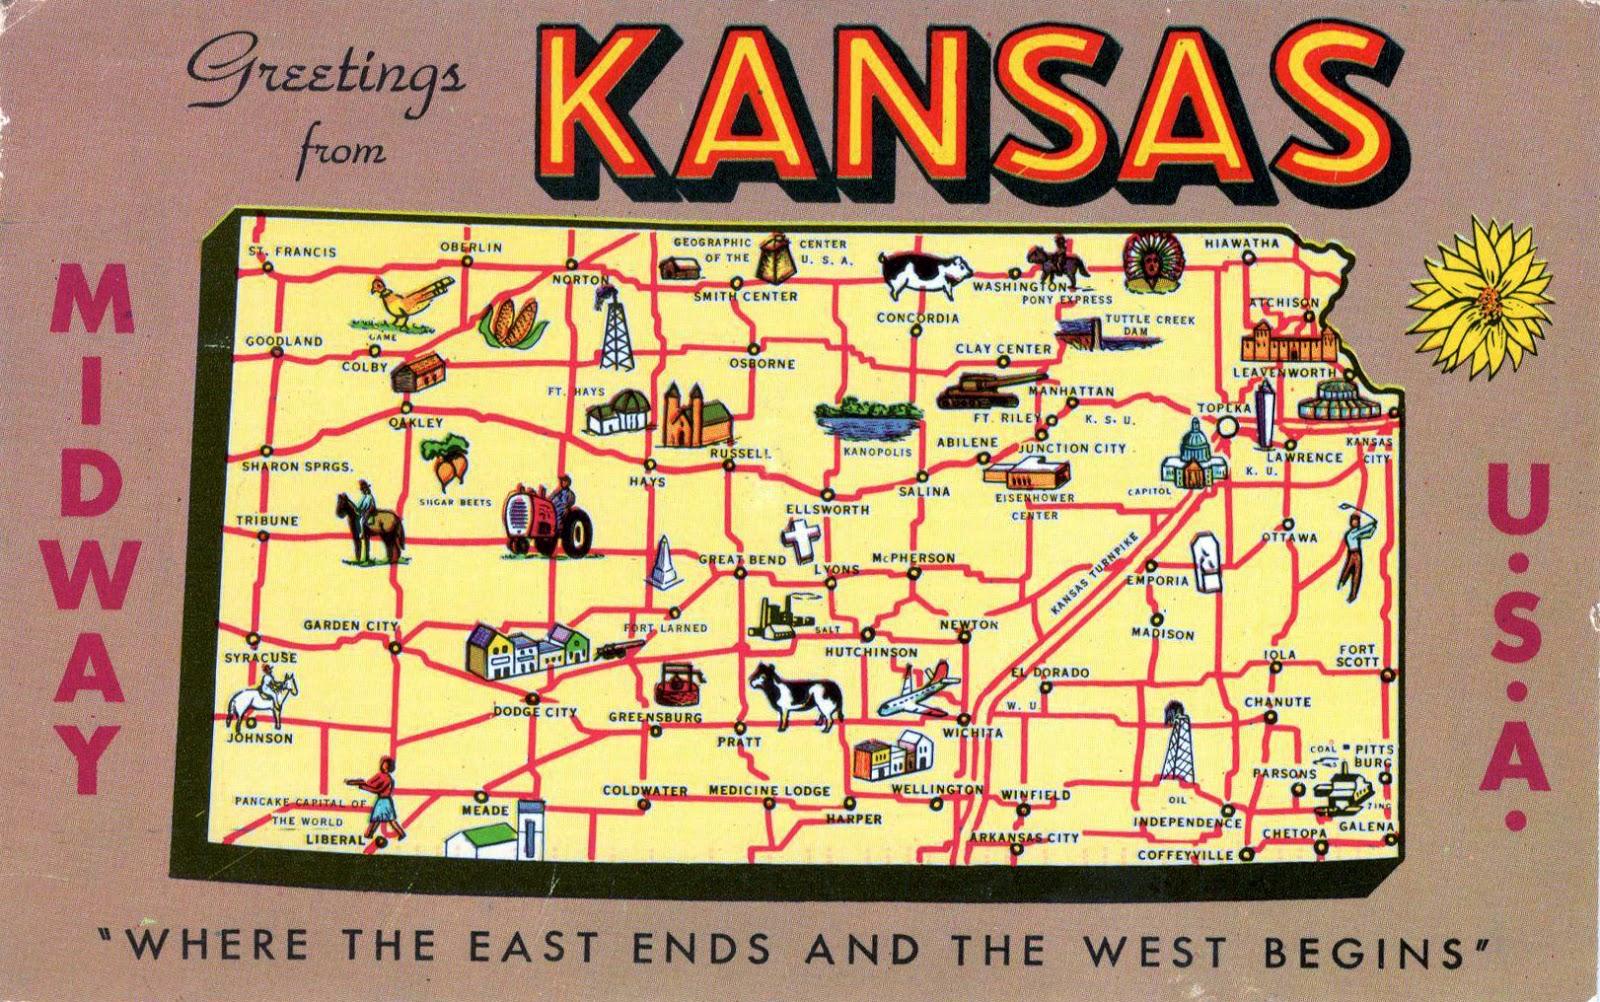 WORLD, COME TO MY HOME!: 2025 UNITED STATES (Kansas) - Kansas map